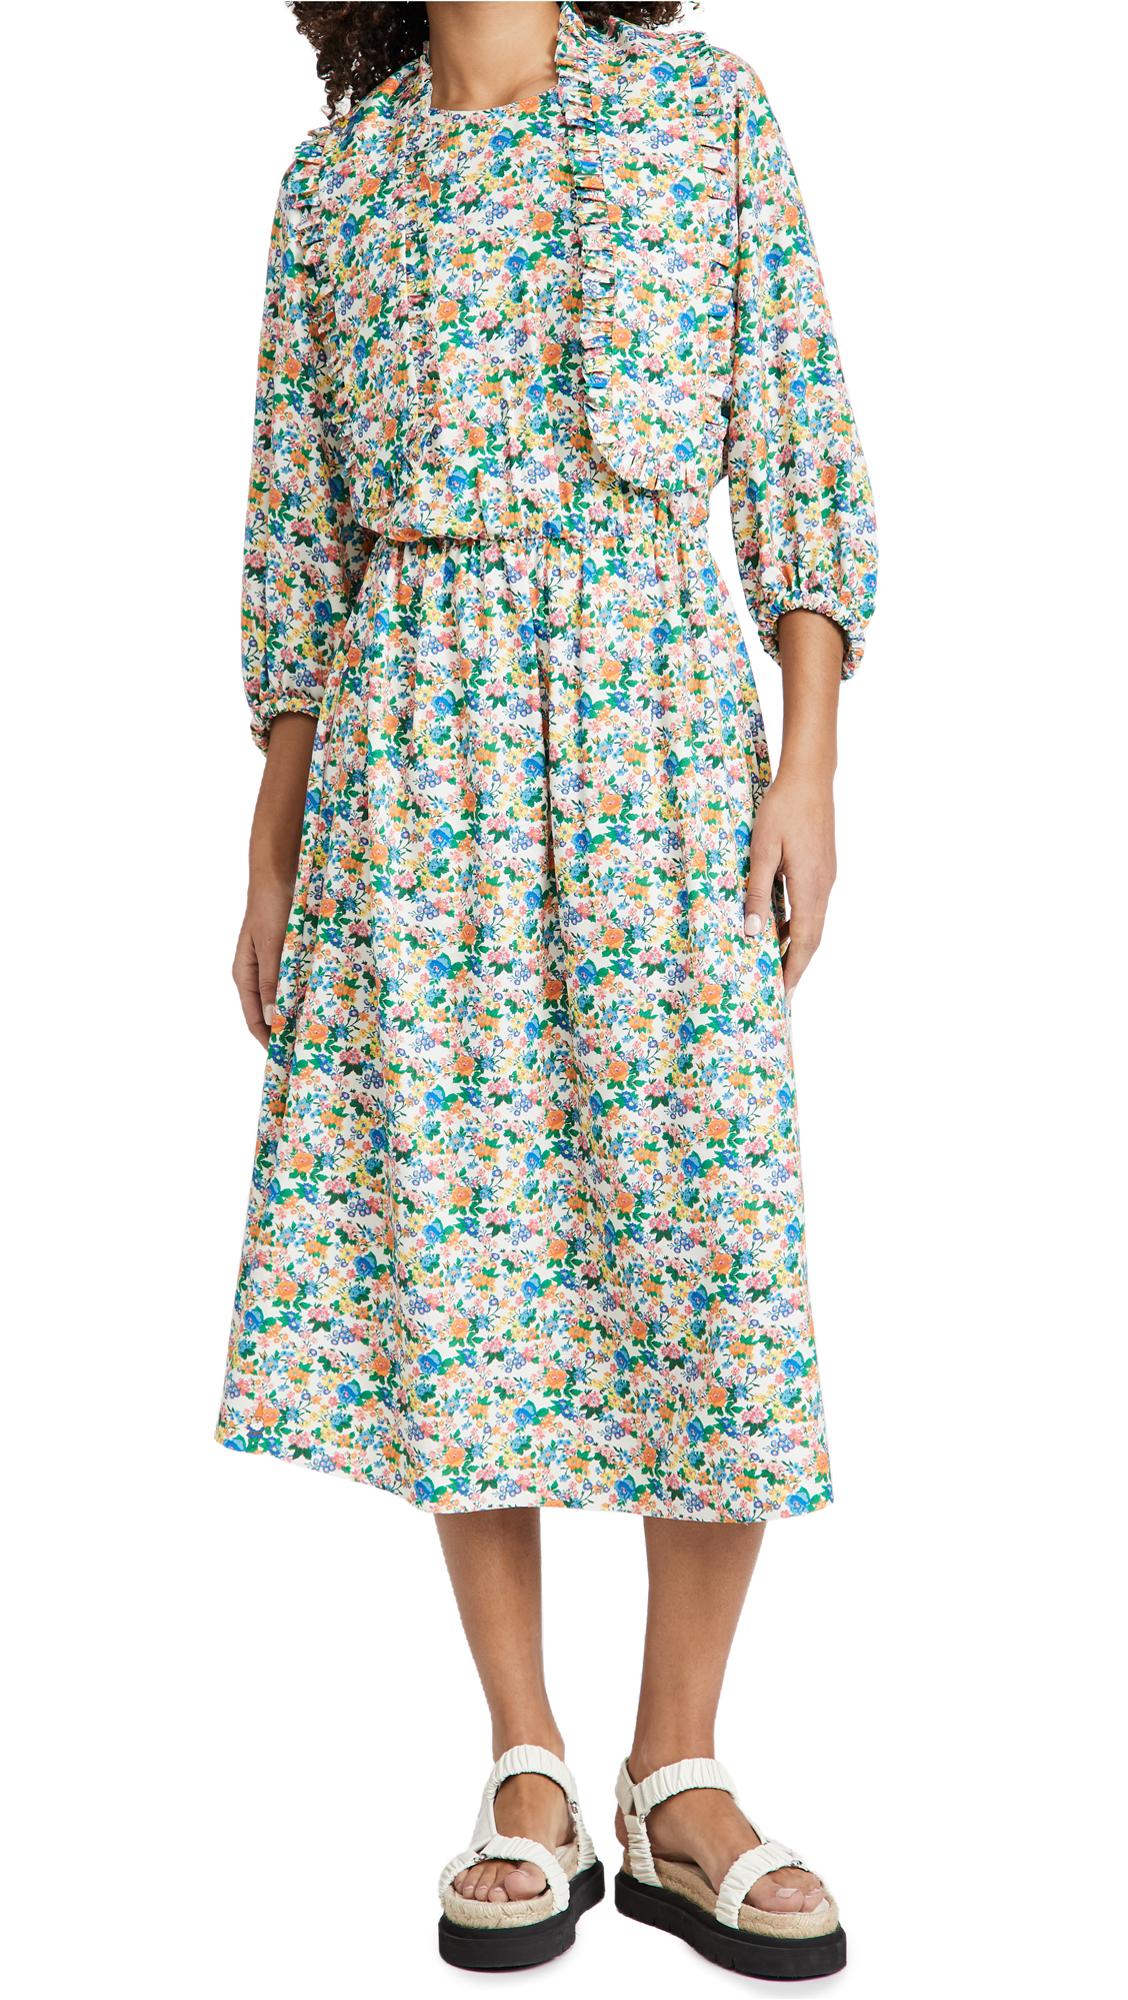 Tibi Sabine Floral Allonge Collar Dress